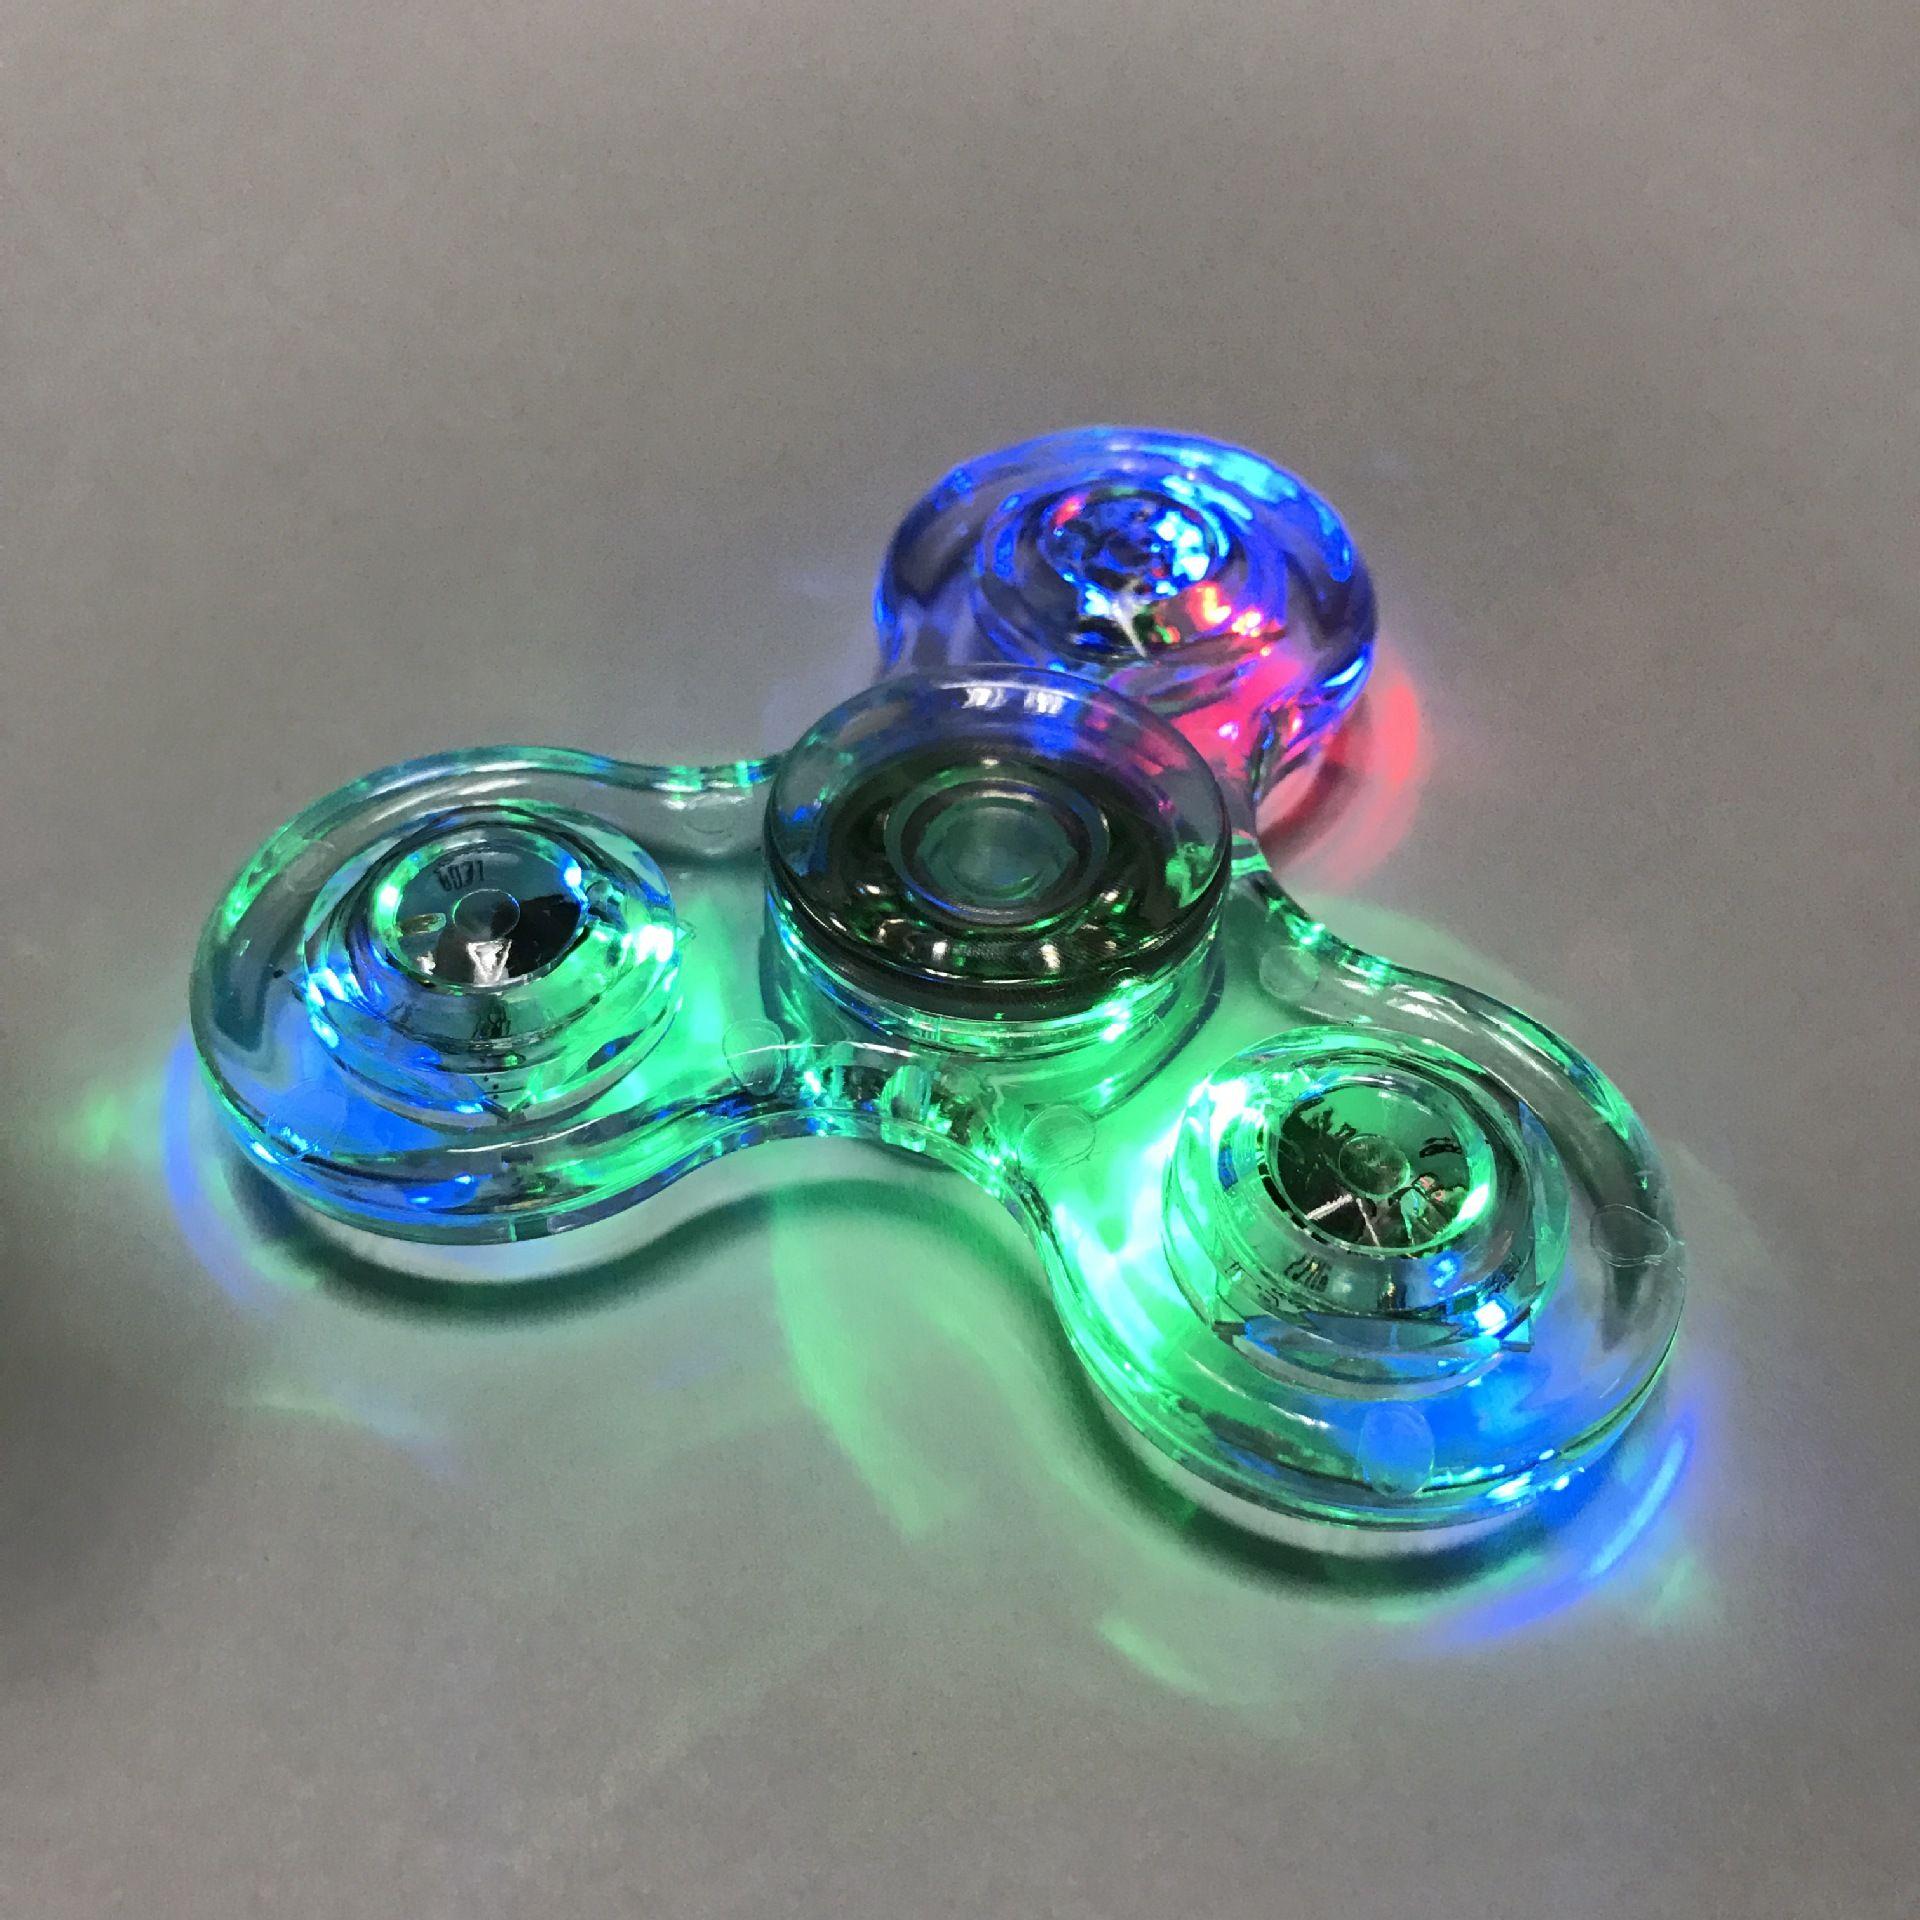 Tri-Spinner Transparente LED-Licht Spinner Hand Kristall Kunststoff EDC Schalter Finger Spinner Zappeln Autismus Relief Angst StressToys